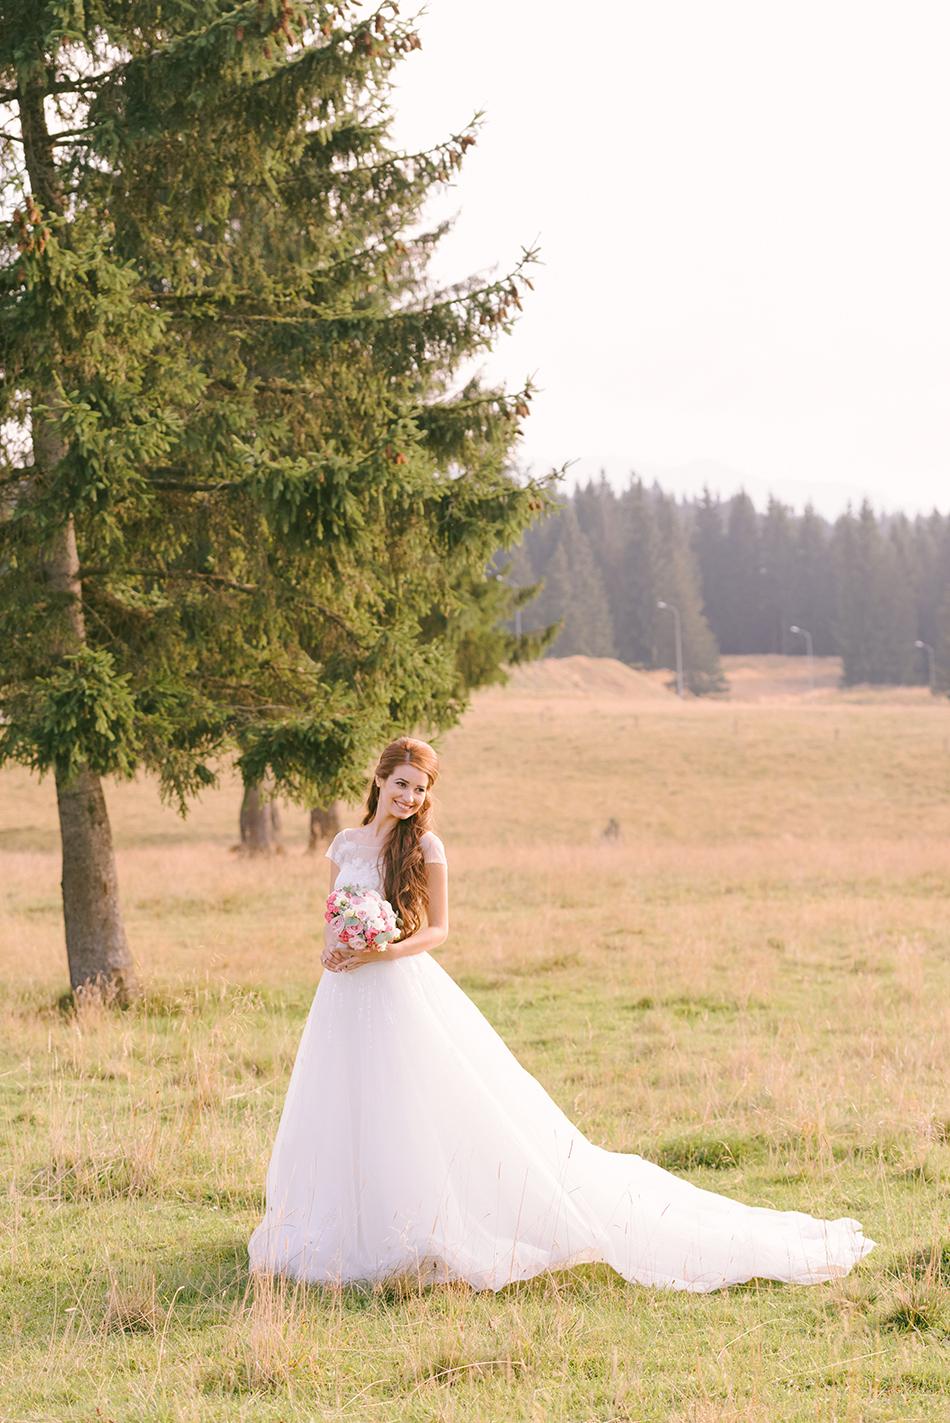 AD Passion Photography | fotograf-nunta-brasov-poiana-brasov-fotograf-profesionist_lorena-cristi_0094 | Adelin, Dida, fotograf profesionist, fotograf de nunta, fotografie de nunta, fotograf Timisoara, fotograf Craiova, fotograf Bucuresti, fotograf Arad, nunta Timisoara, nunta Arad, nunta Bucuresti, nunta Craiova